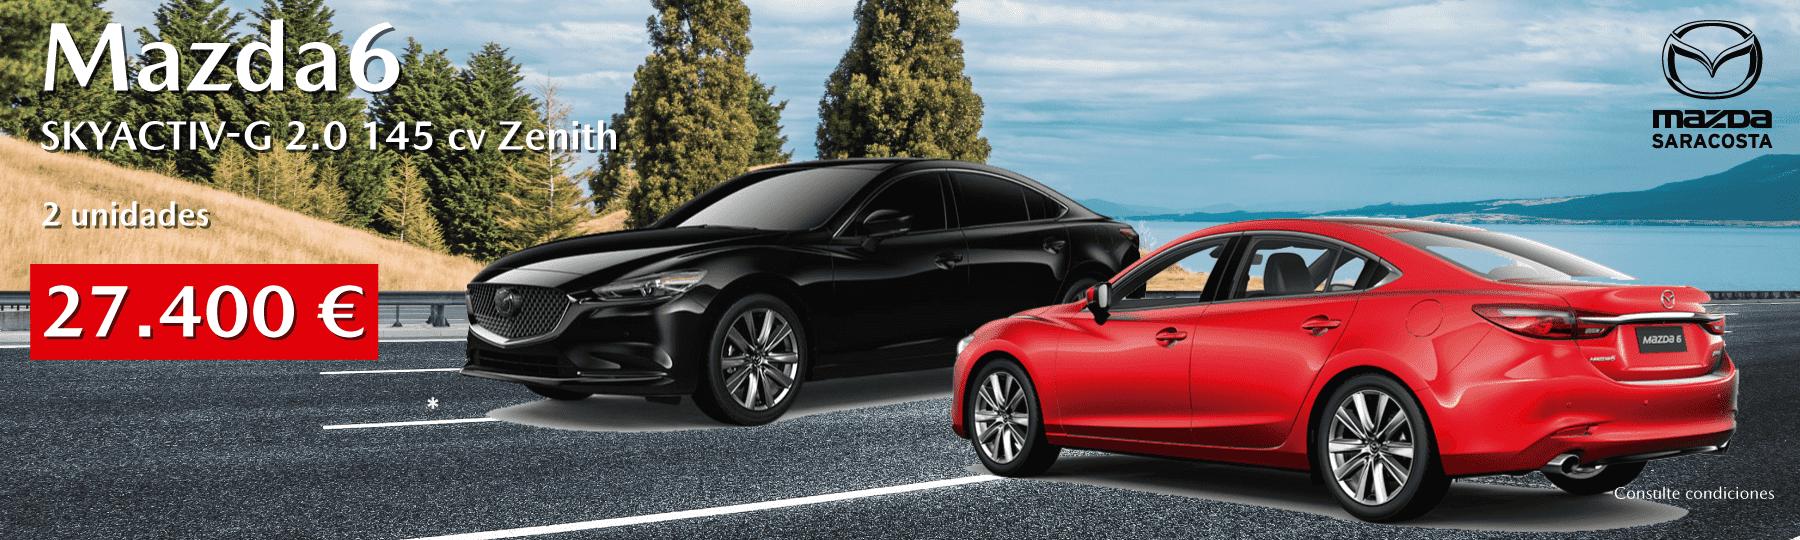 Mazda6 Zenith por 27.400 €